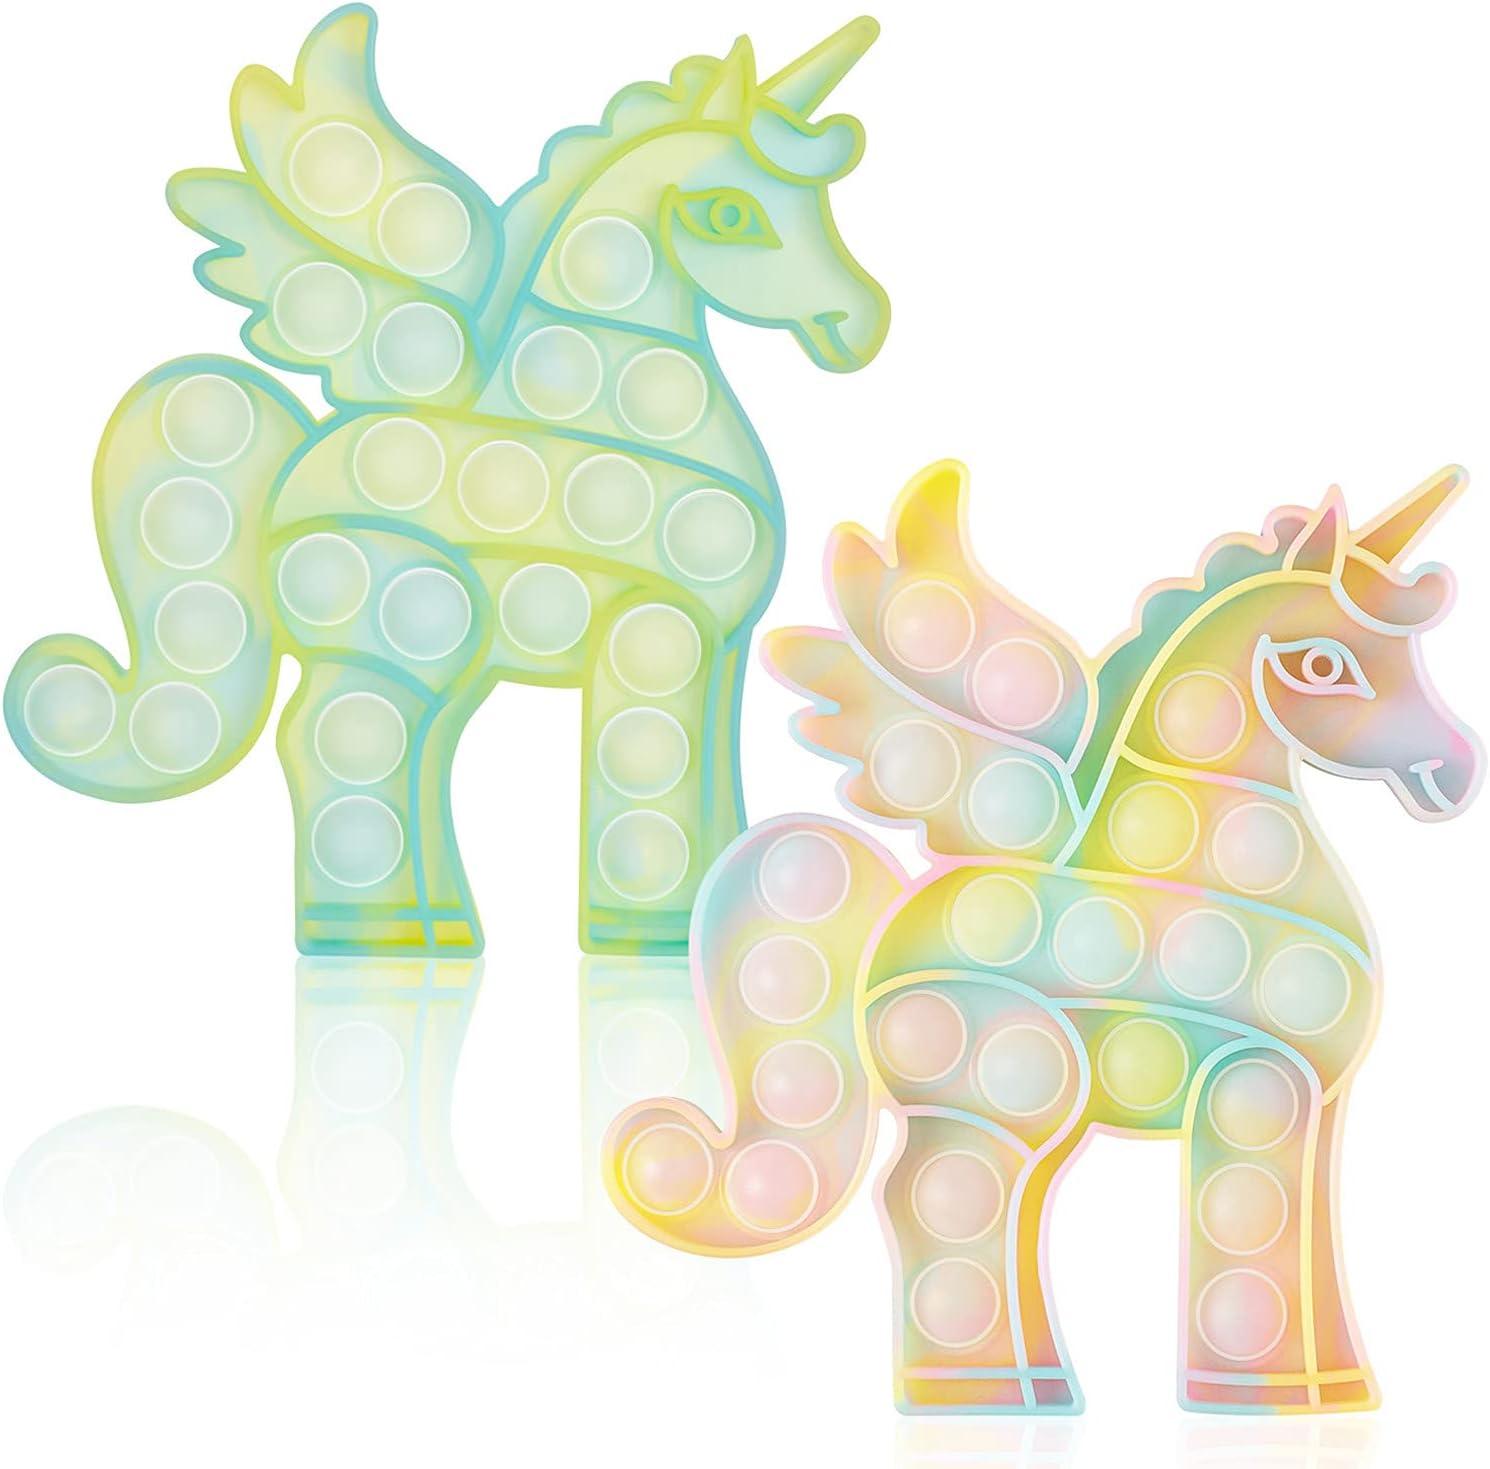 WHATOOK Glow in The Dark Unicorn Pack Toy: Fidget Long Beach Mall Pop Fluoresc 2 Bombing new work